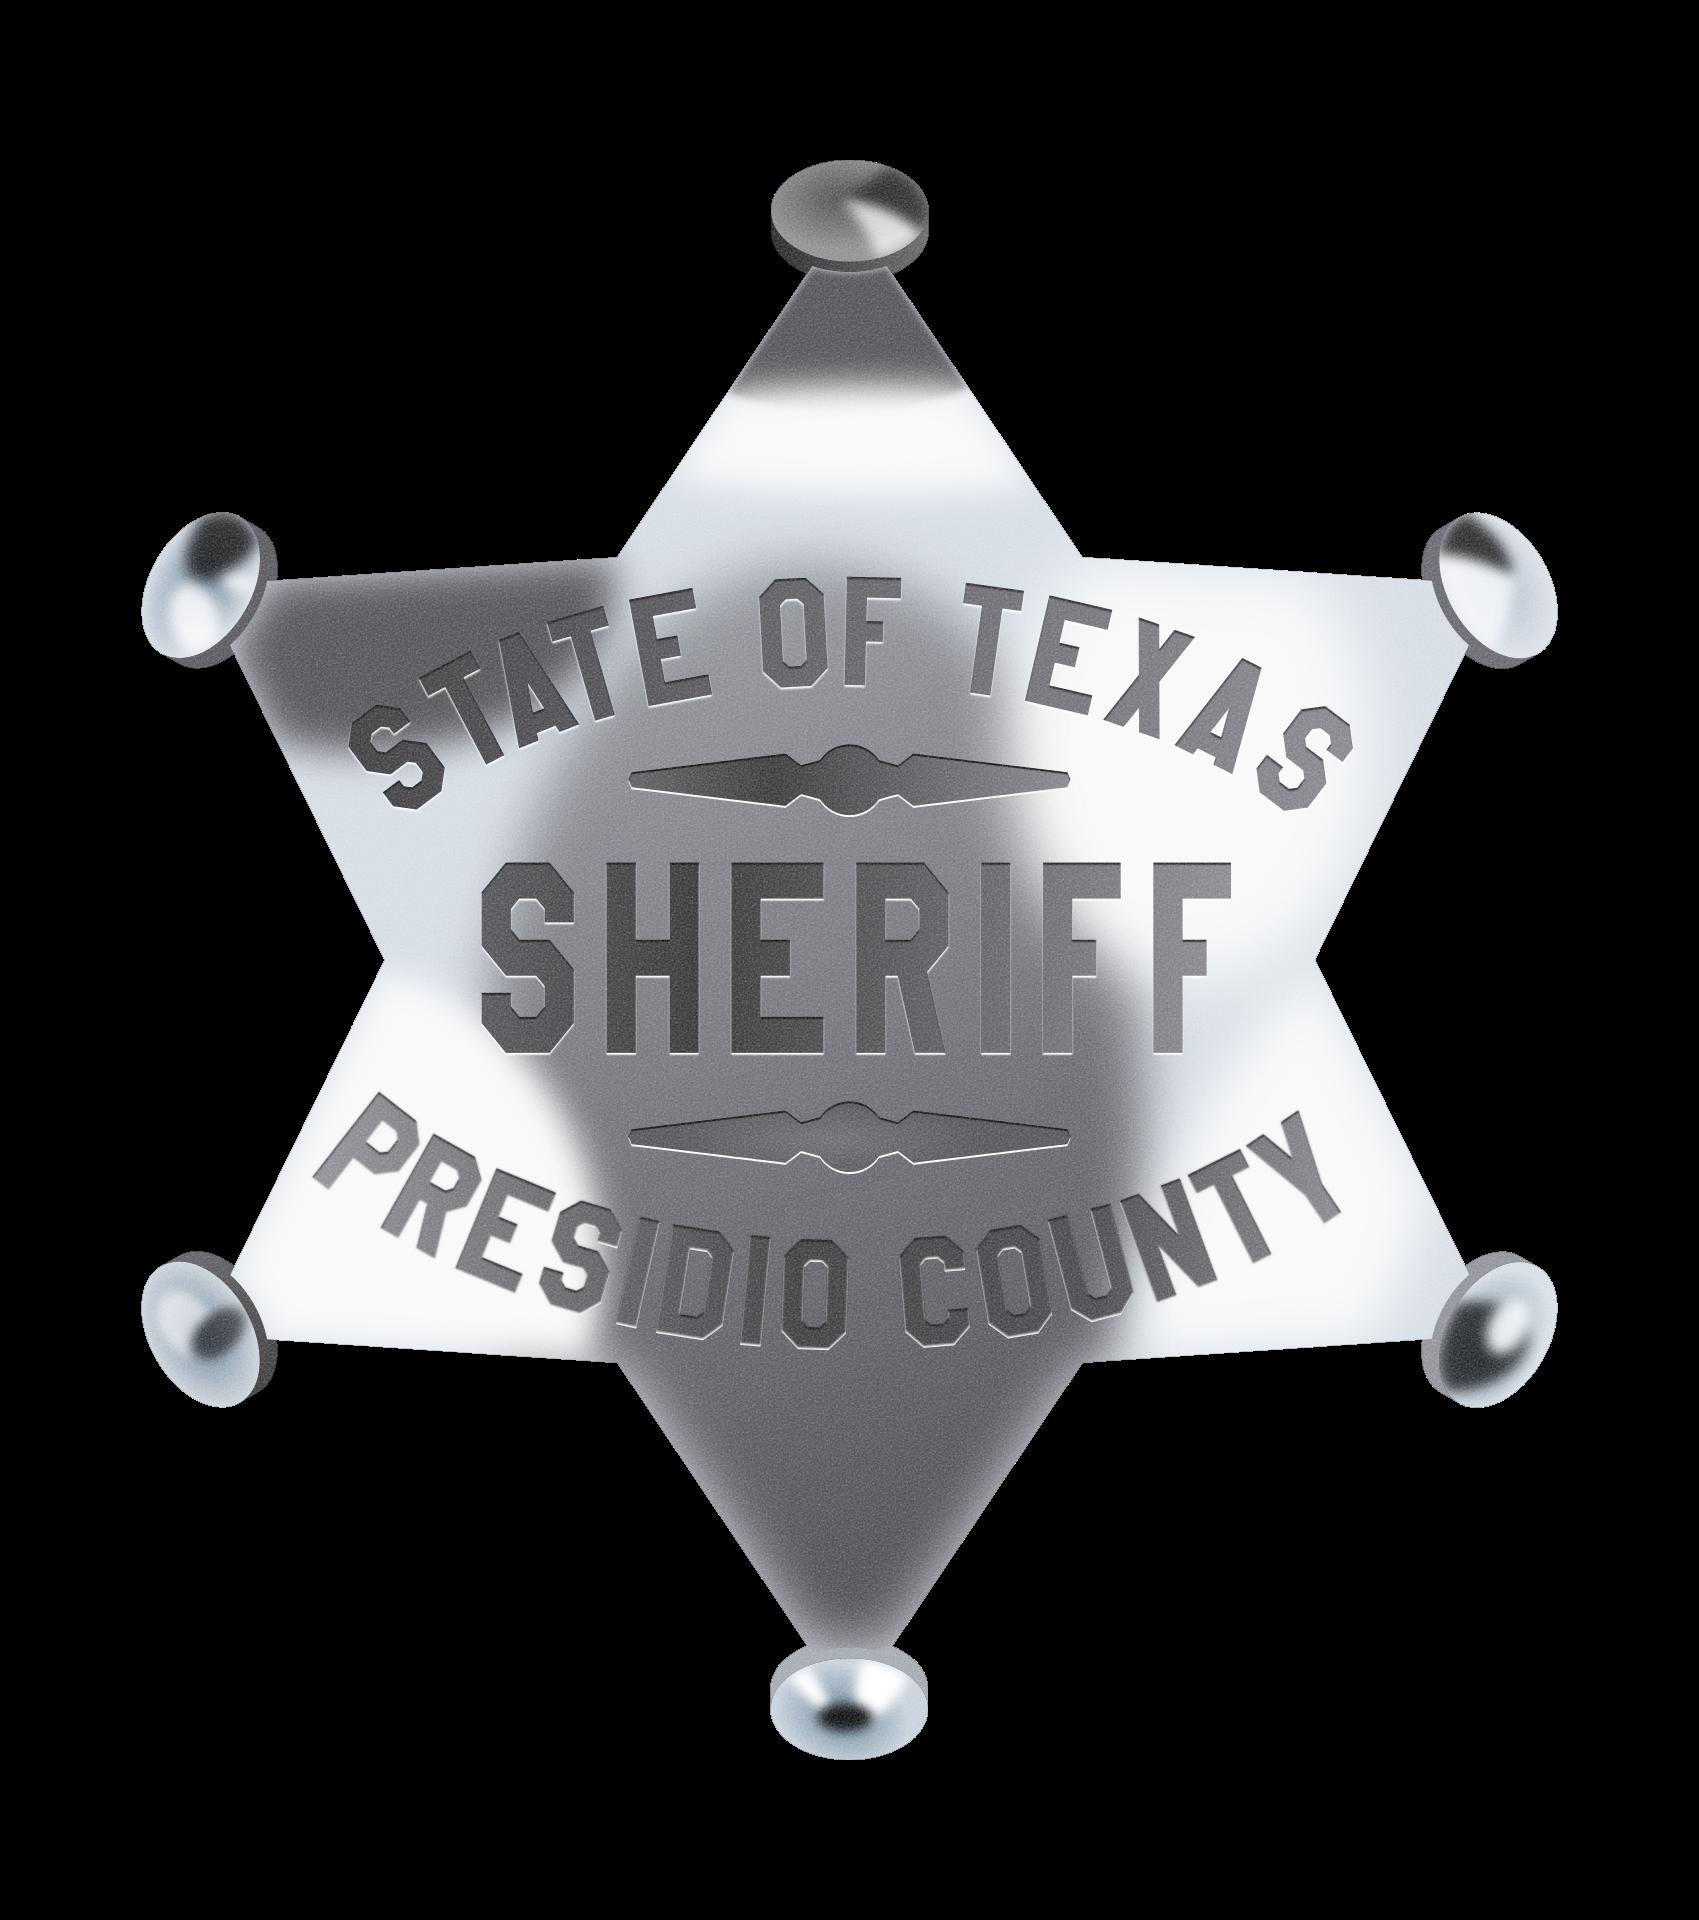 badge-2024114-1526486097.png